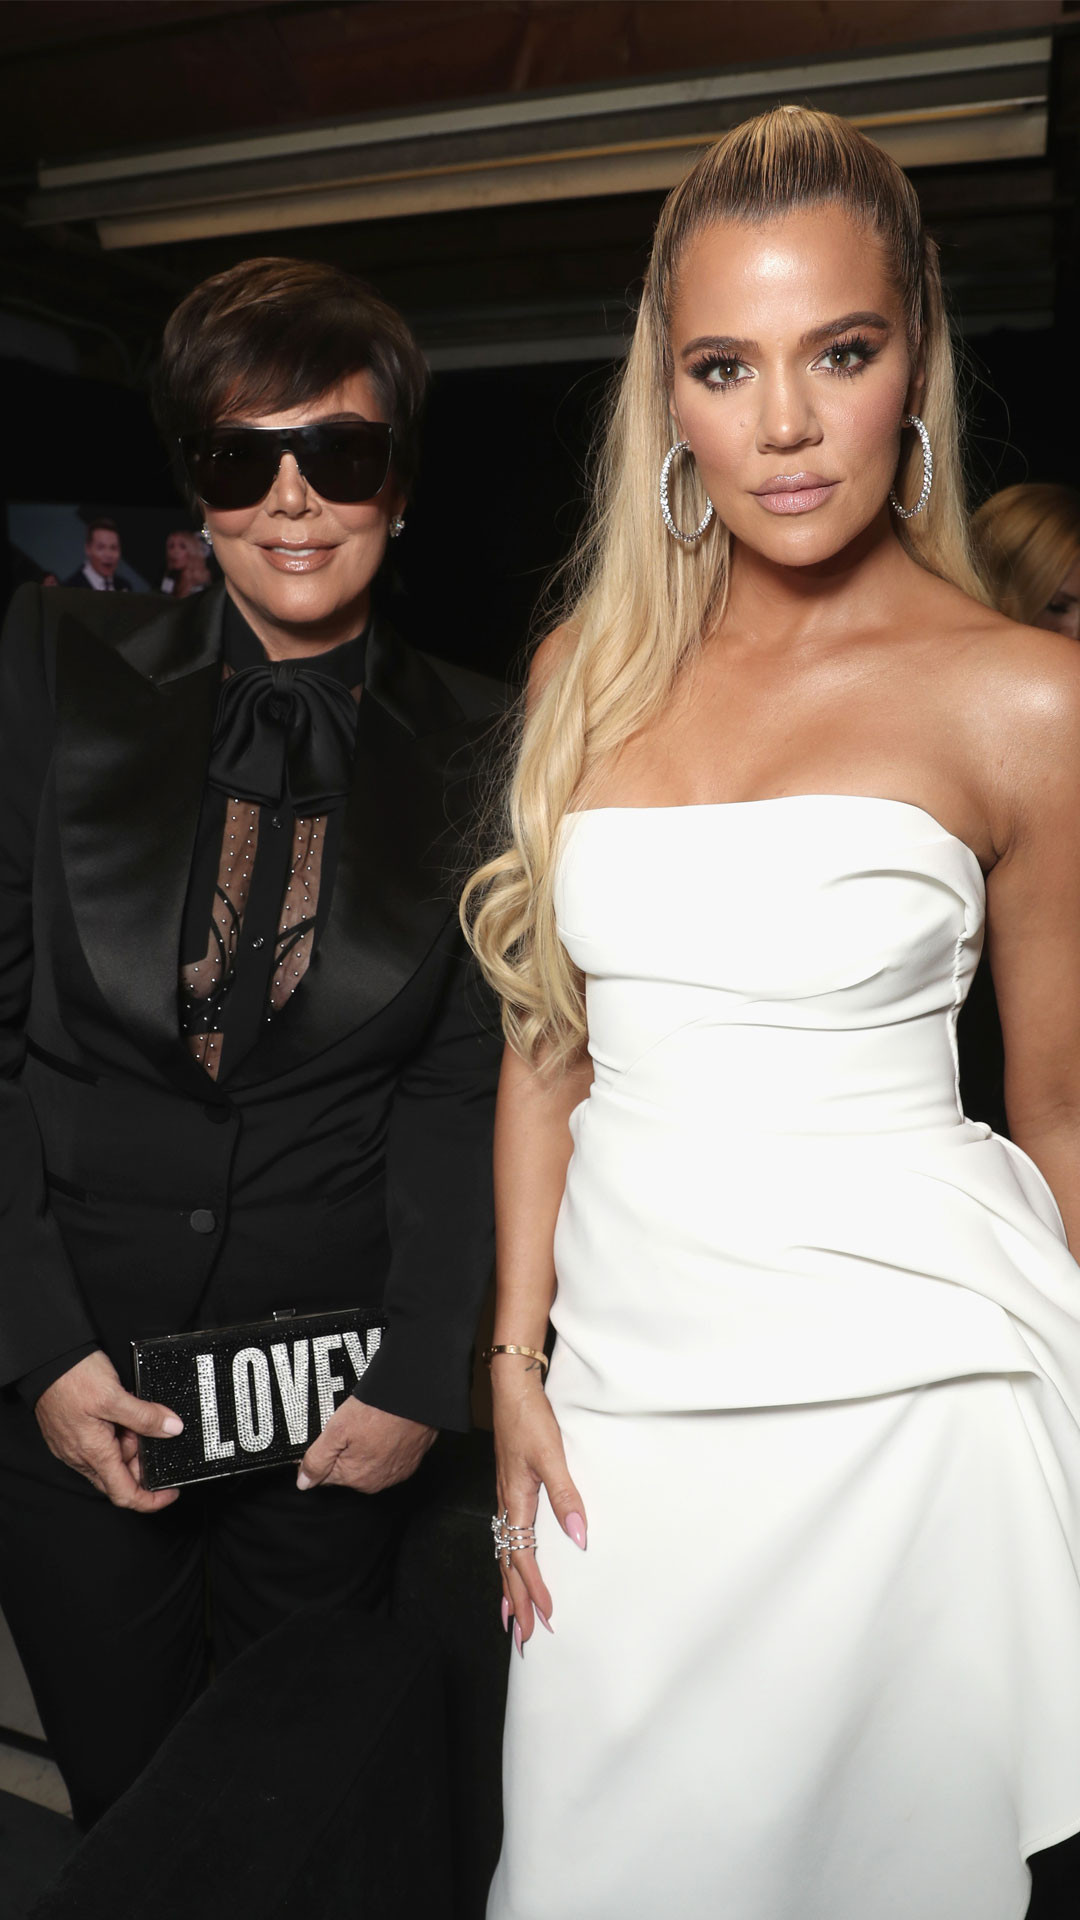 Kris Jenner, Khloe Kardashian, 2018 Peoples Choice Awards, Backstage